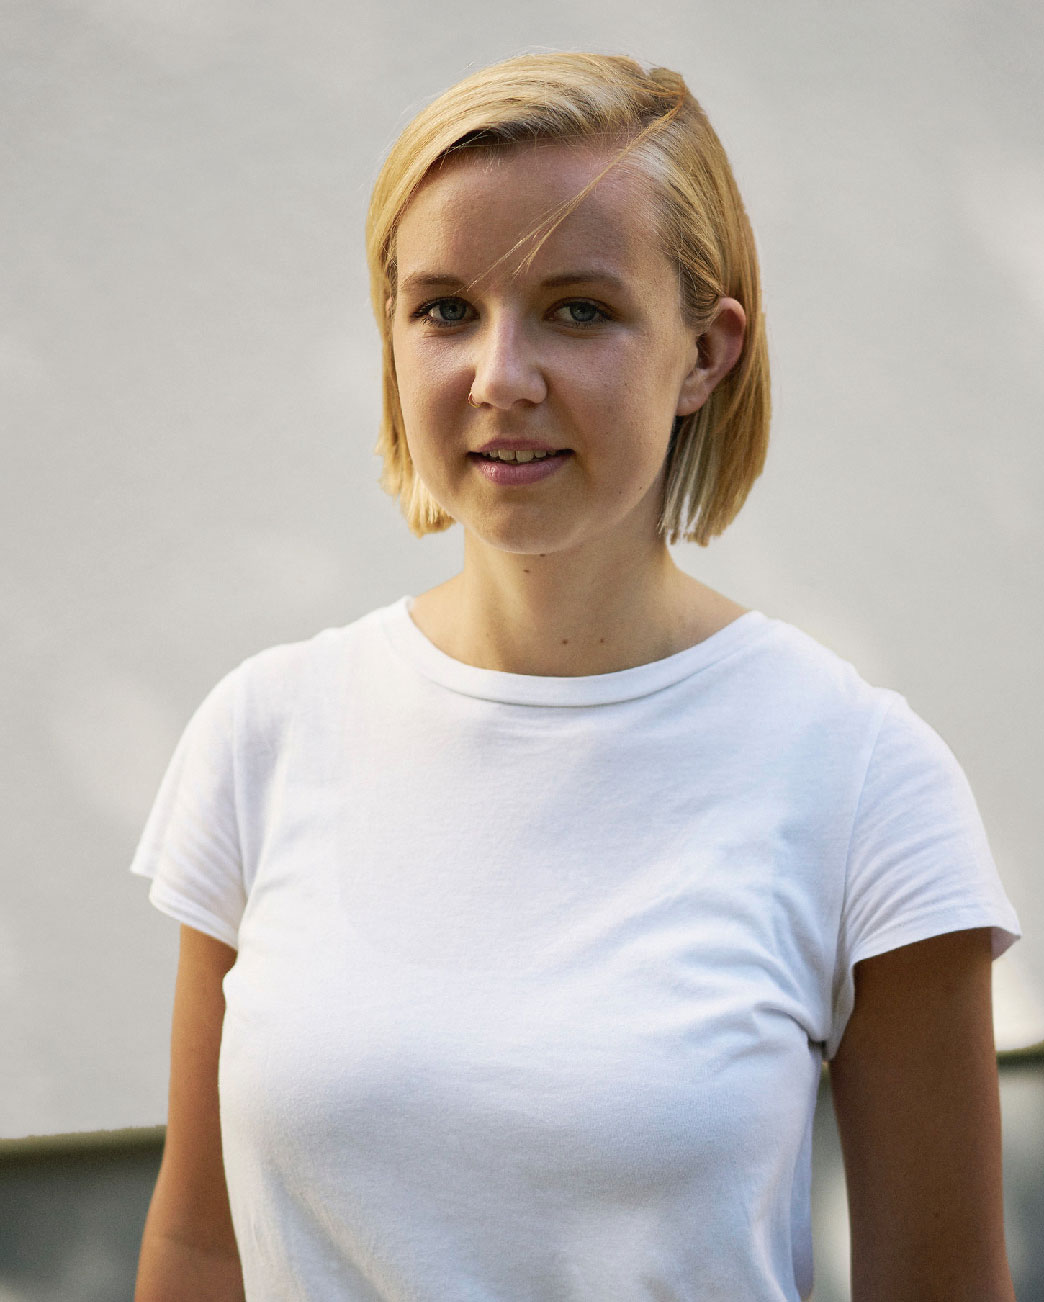 EGL_KatharinaLiesenberg.jpg